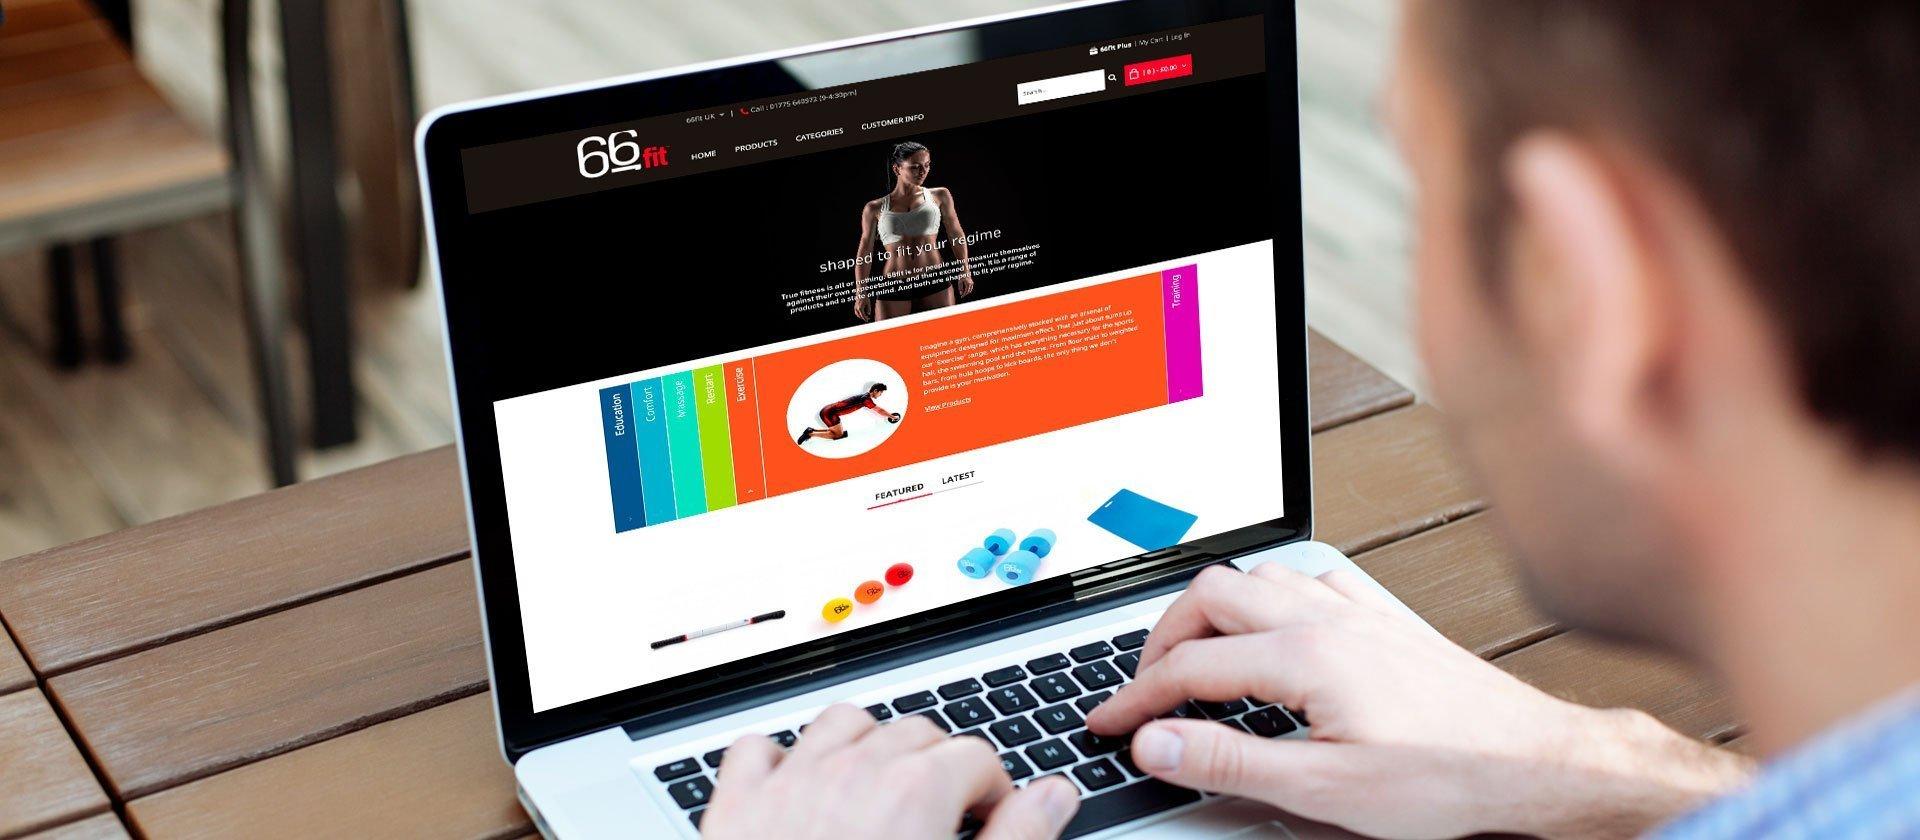 66fit-website